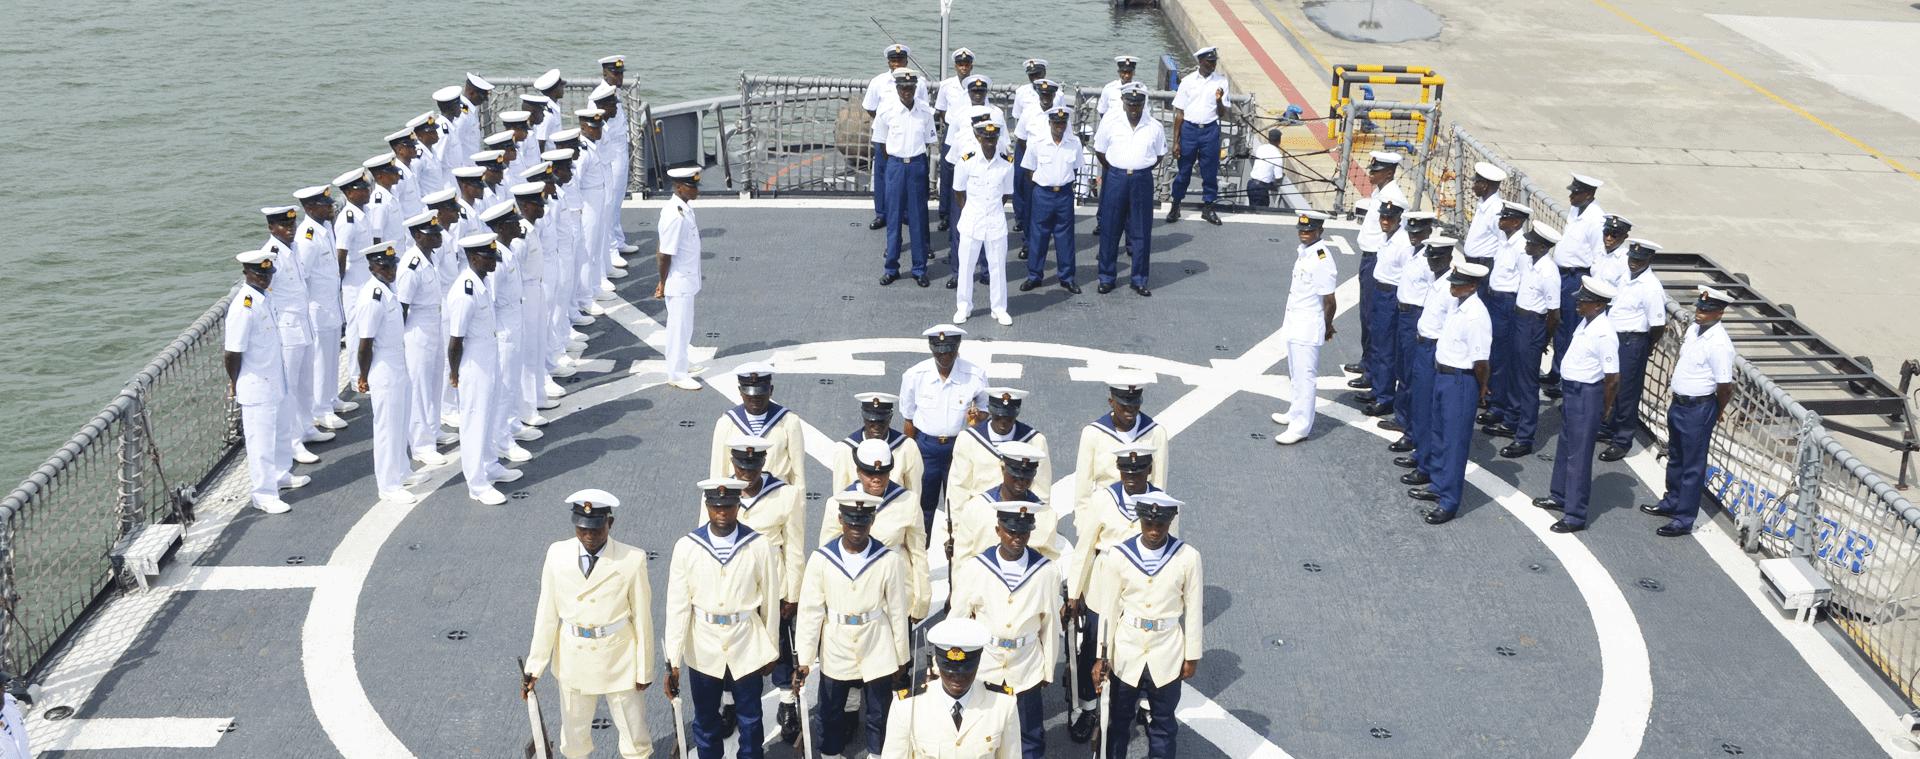 How to Apply for Nigerian Navy DSSC Recruitment www.joinnigeriannavy.com